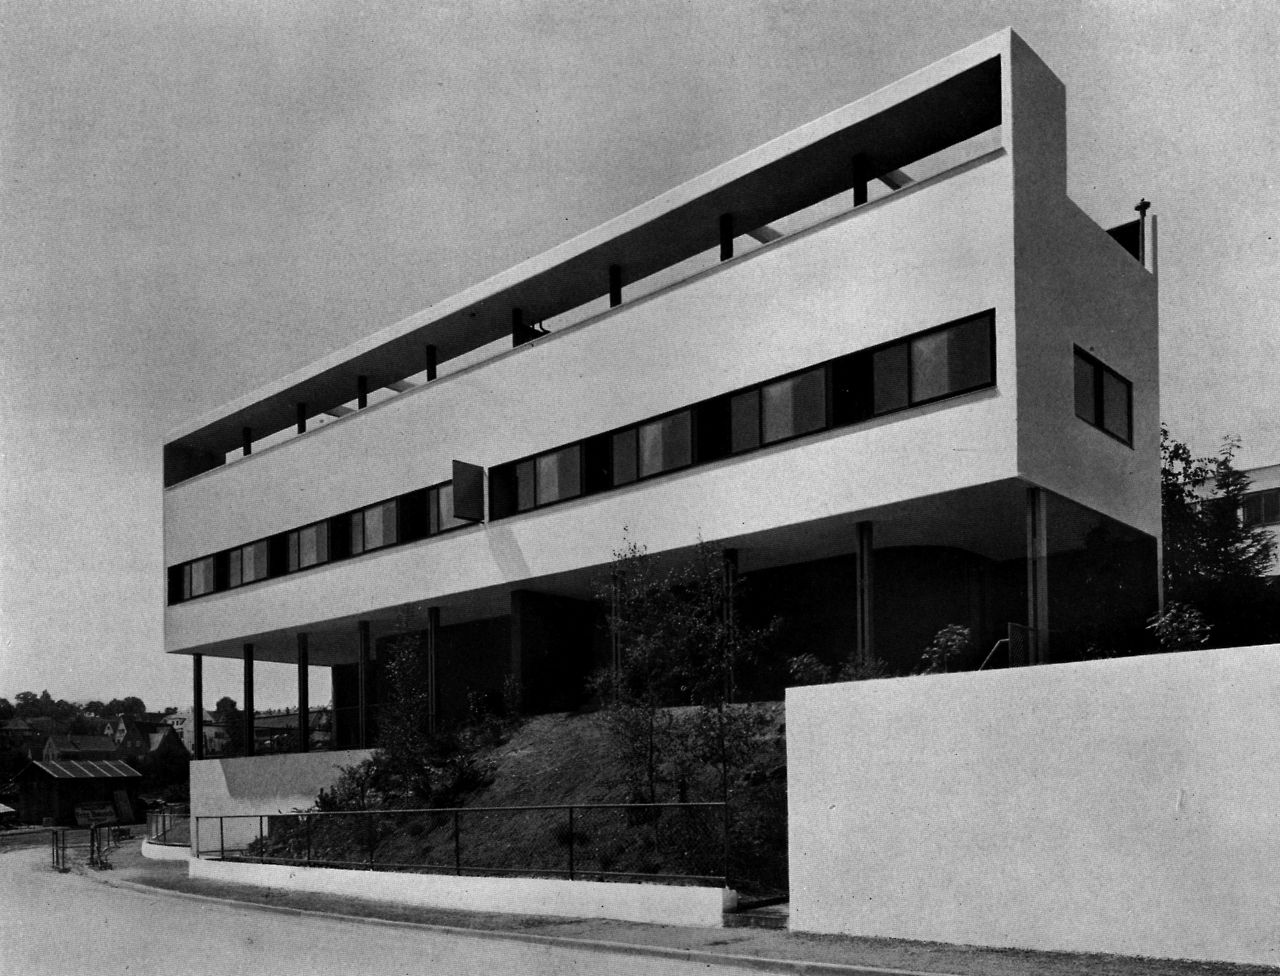 le corbusier double house weissenhofsiedlung stuttgart germany 1927 lvsea. Black Bedroom Furniture Sets. Home Design Ideas